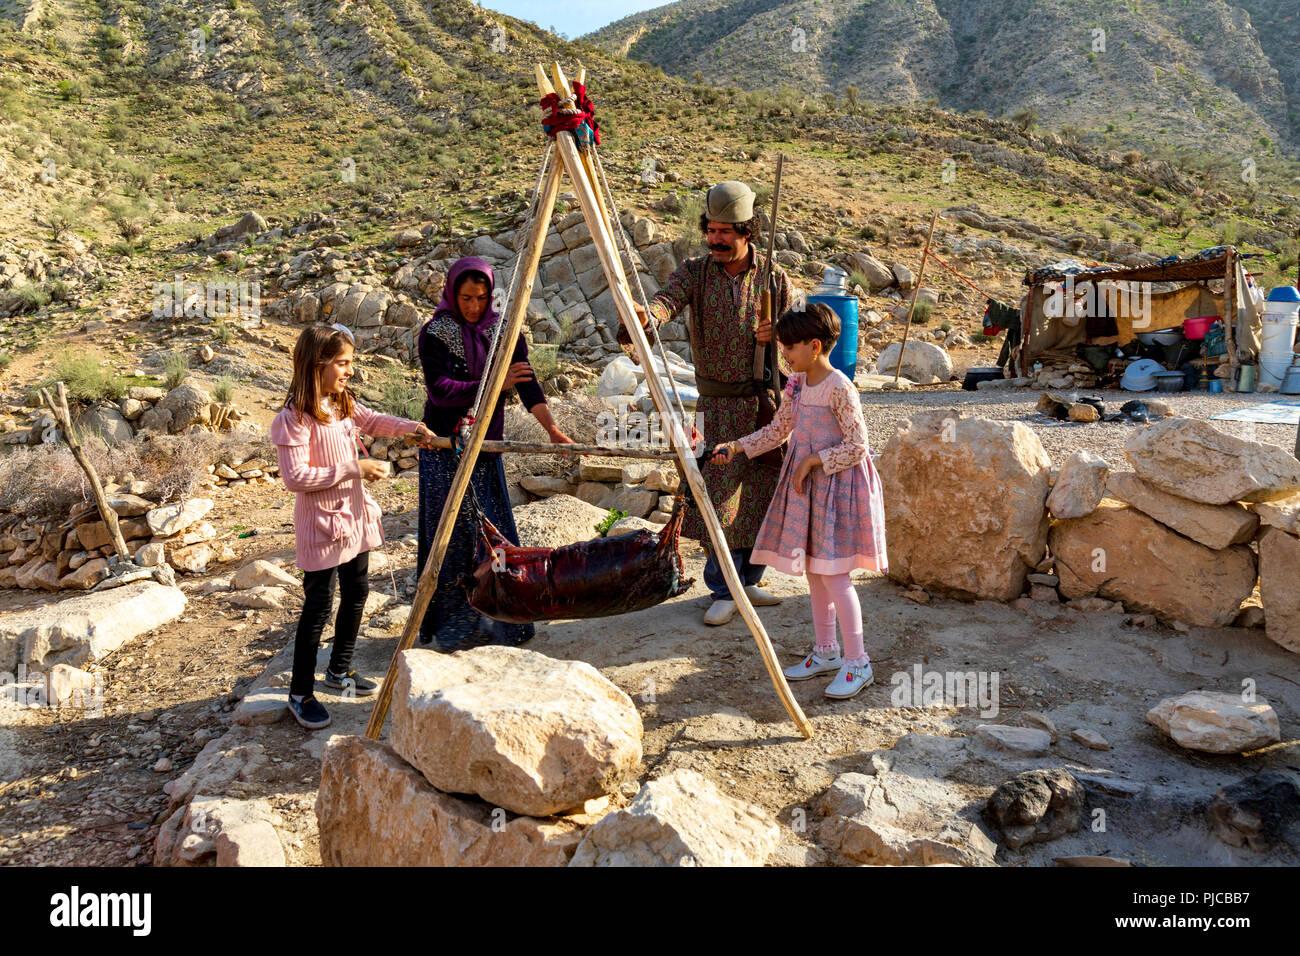 Islamic Republic of Iran. . Fars Province, Rudbal. Qashqai nomads churning butter in animal skin bag.  March 10, 2018 - Stock Image